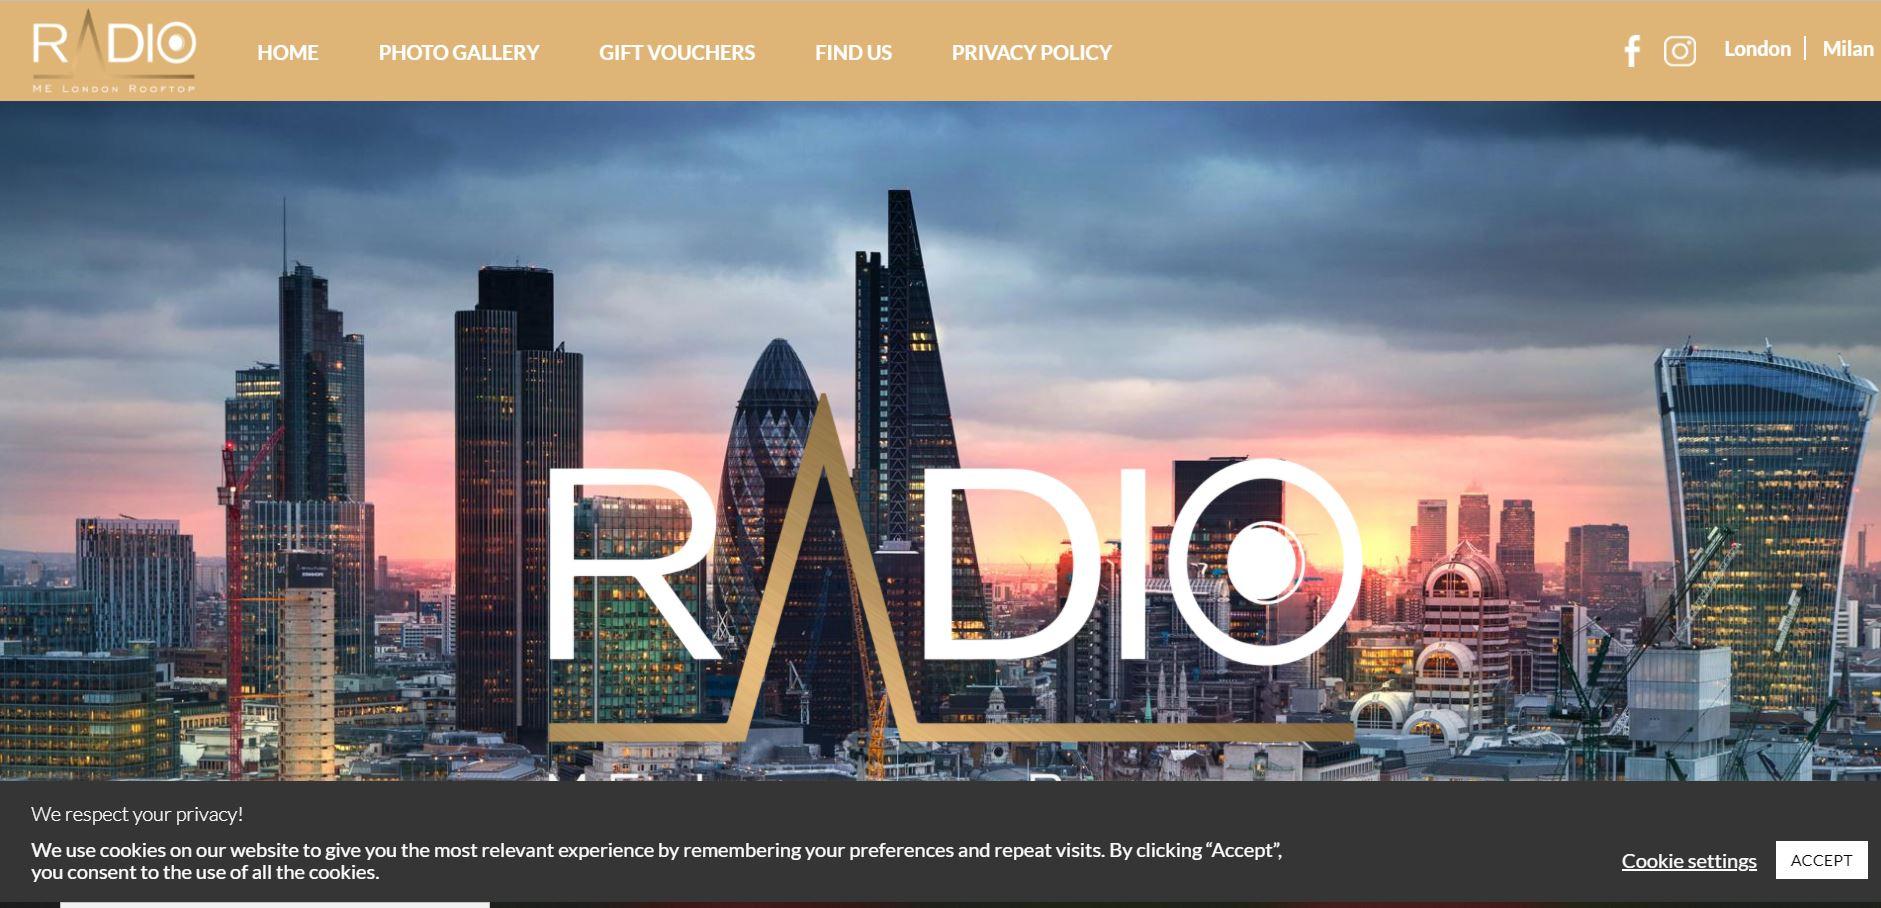 Radio Rooftop